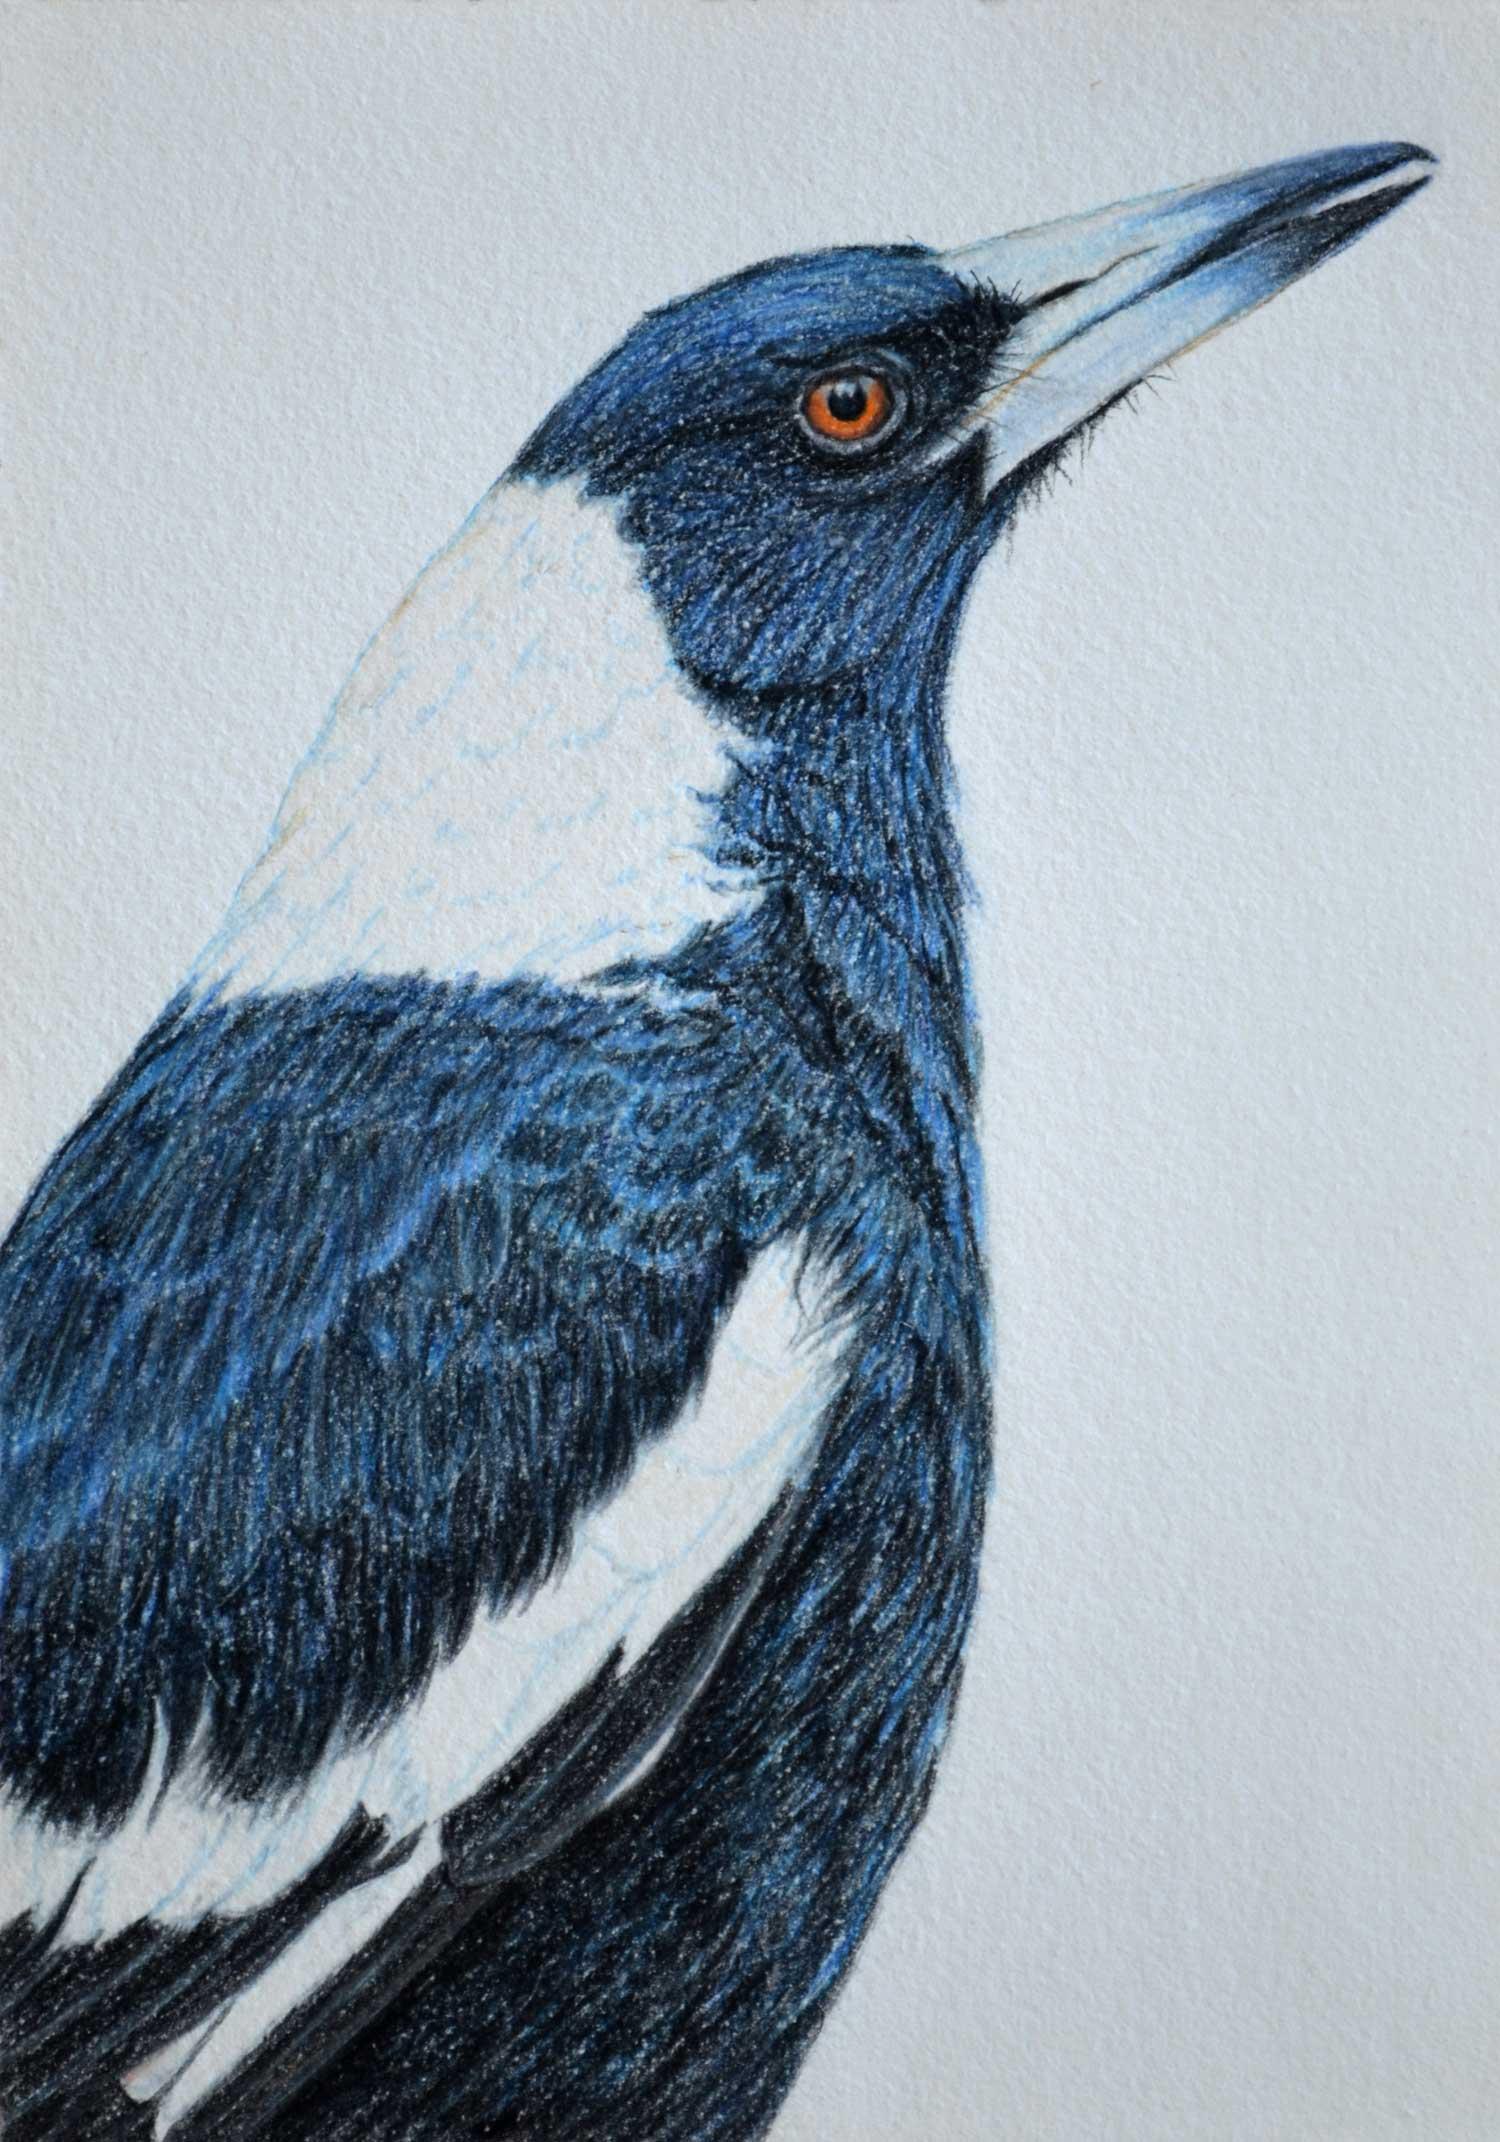 australian-magpie-drawing-rachel-newling.jpg